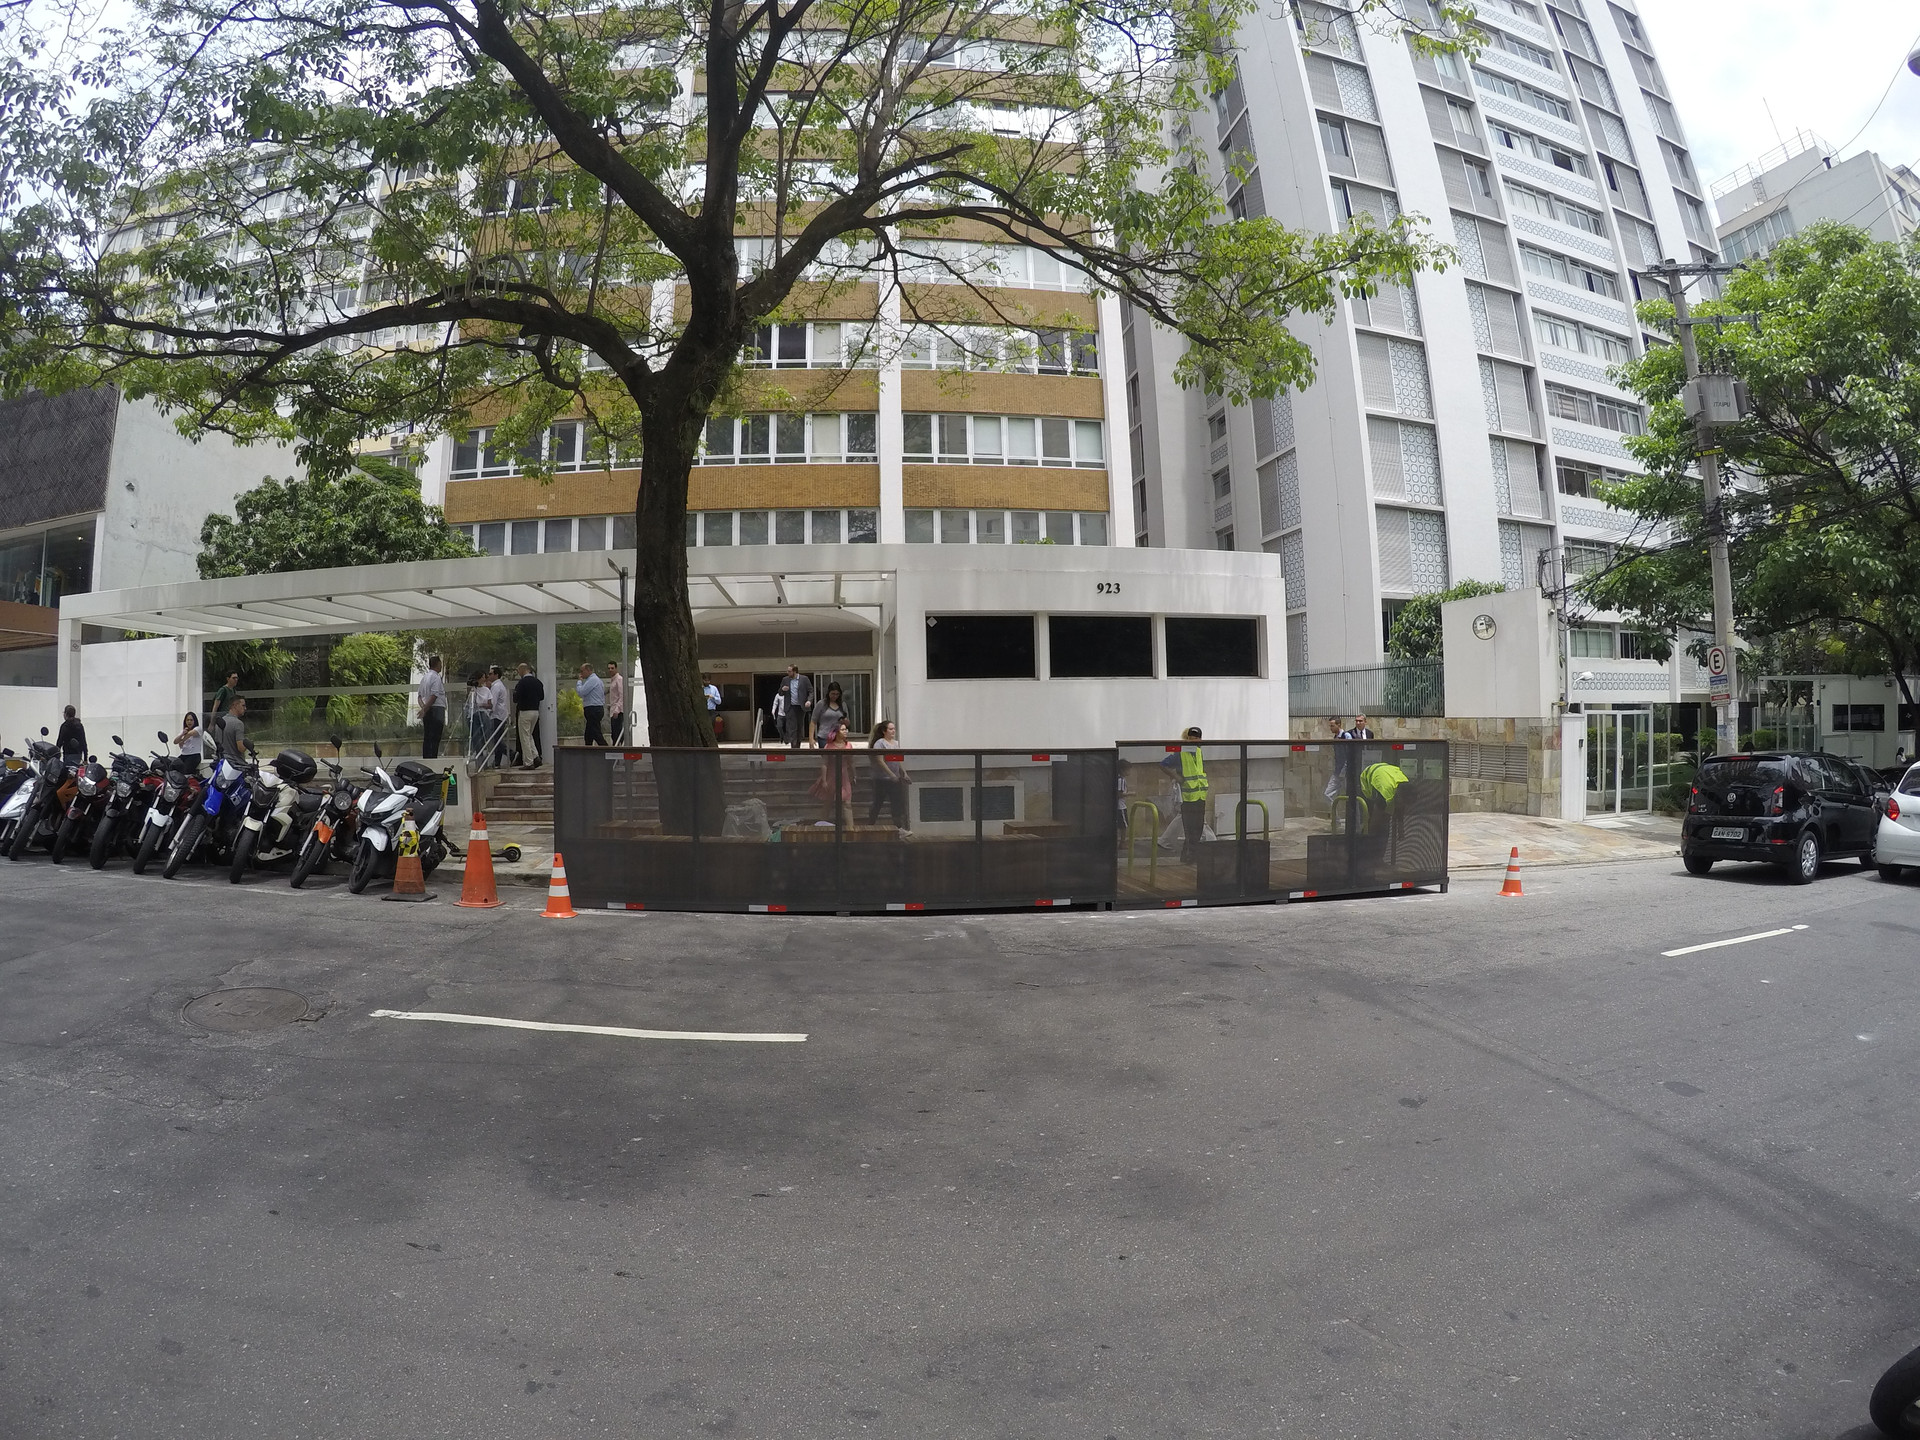 Parklet Condomínio Padre João Manoel